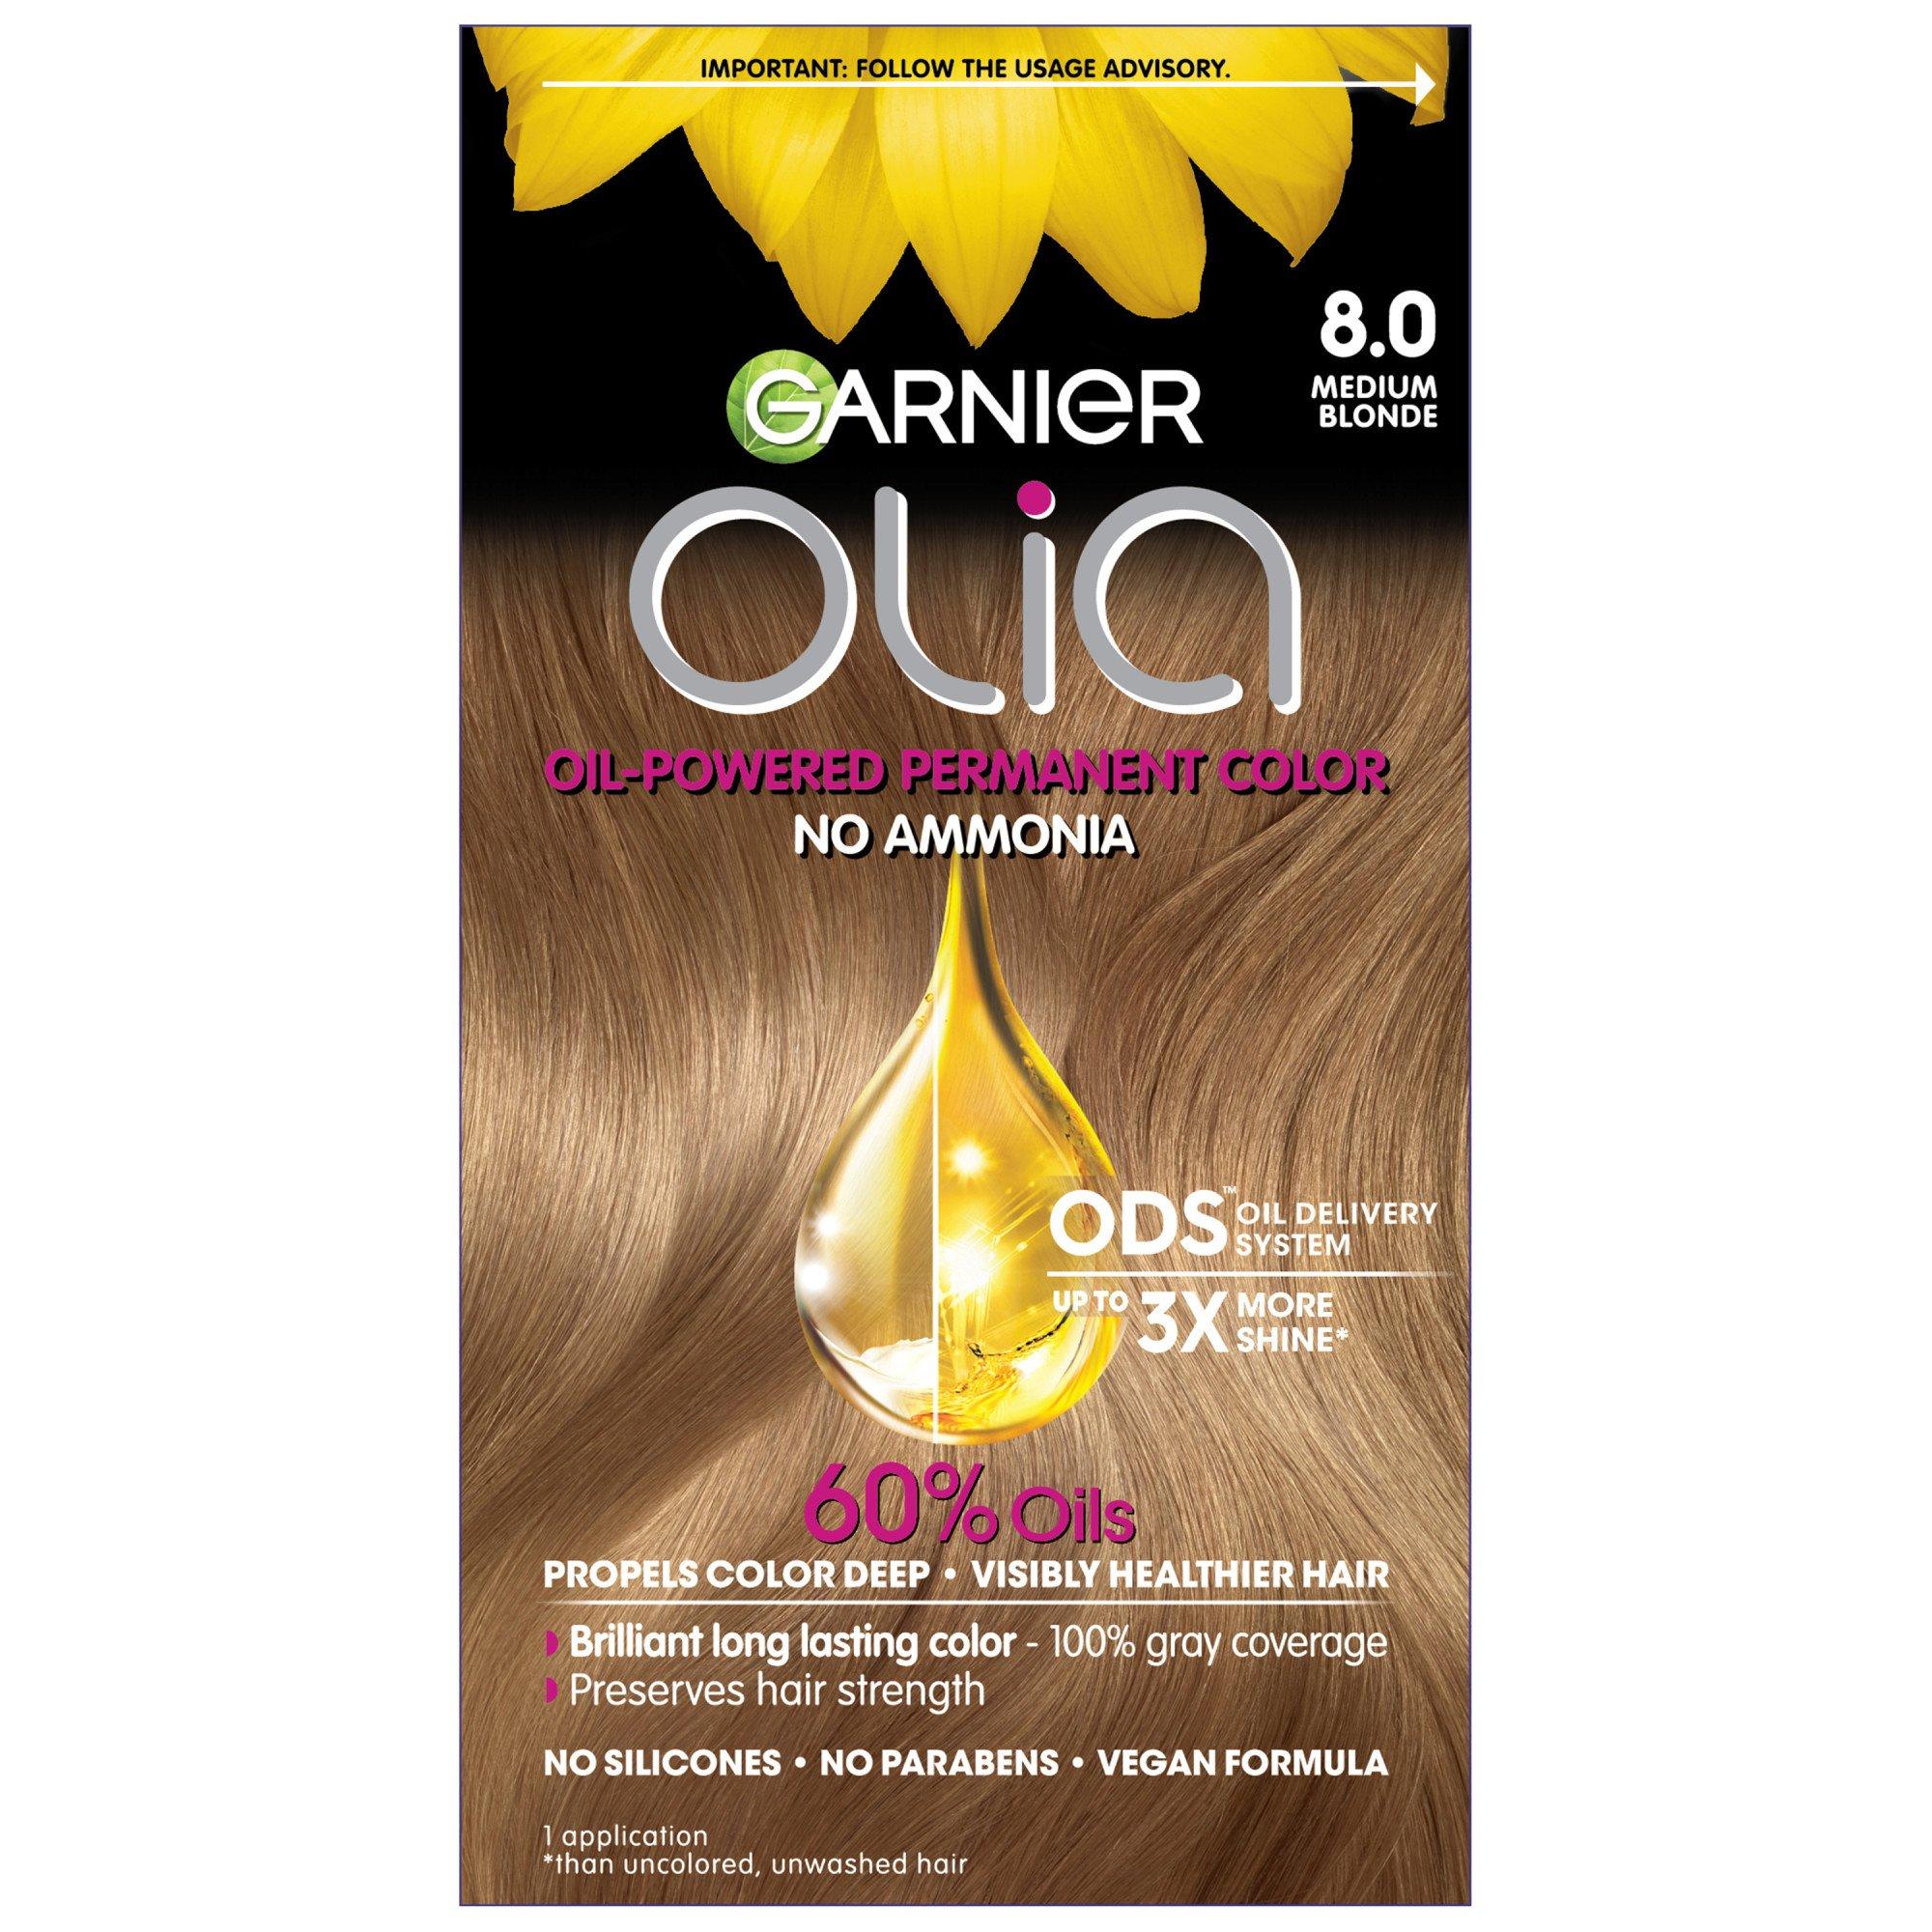 Hair Dye Safe For Pregnancy Spefashion